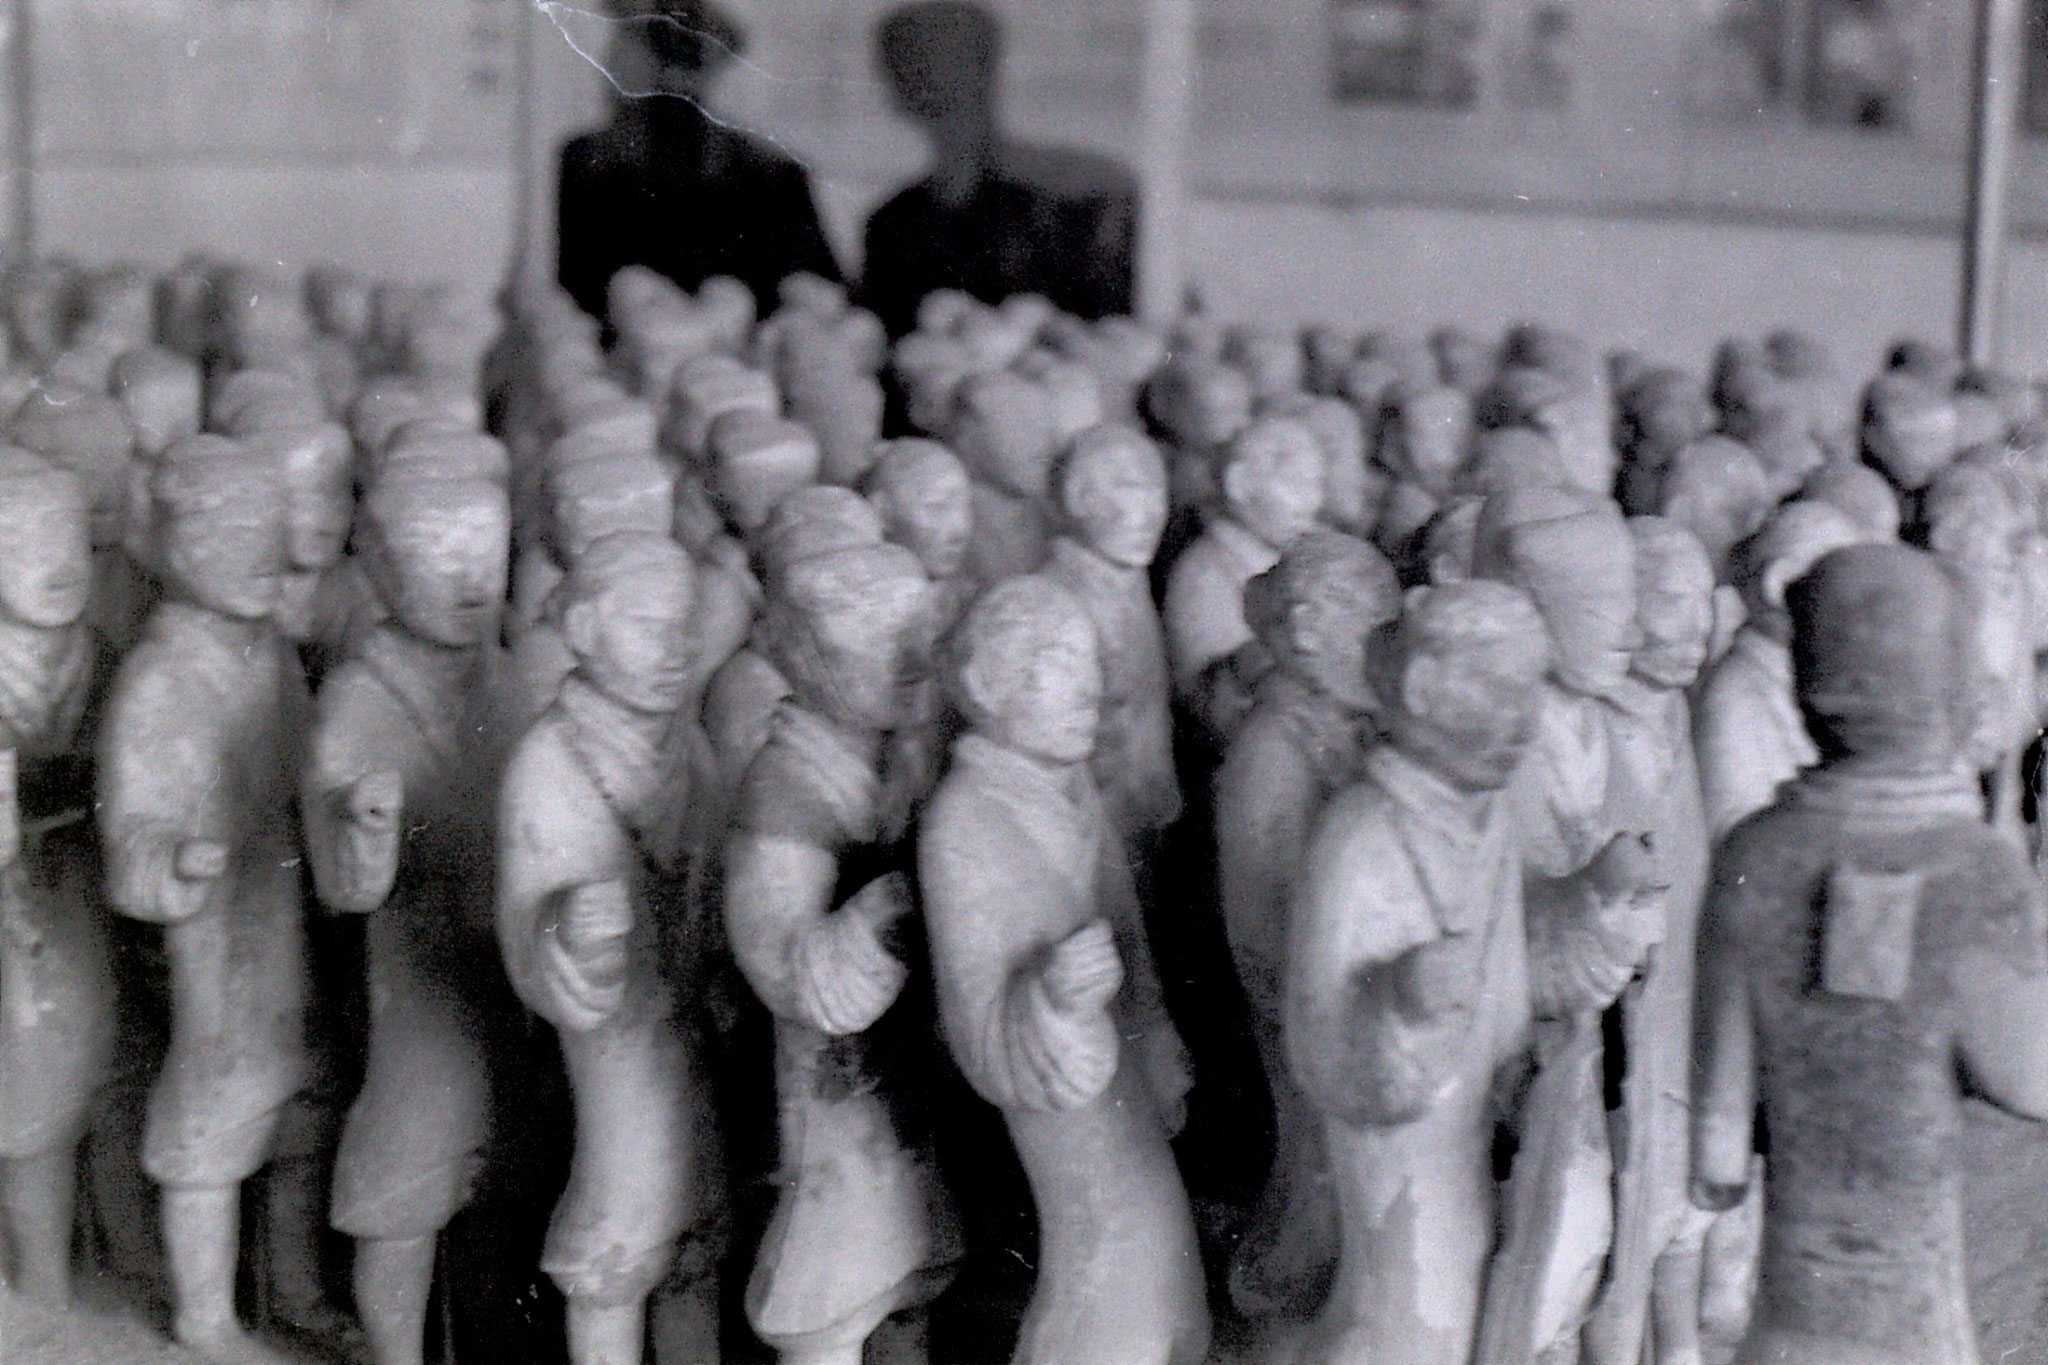 7/3/1989: 24: Xianyang museum miniature terracotta figures